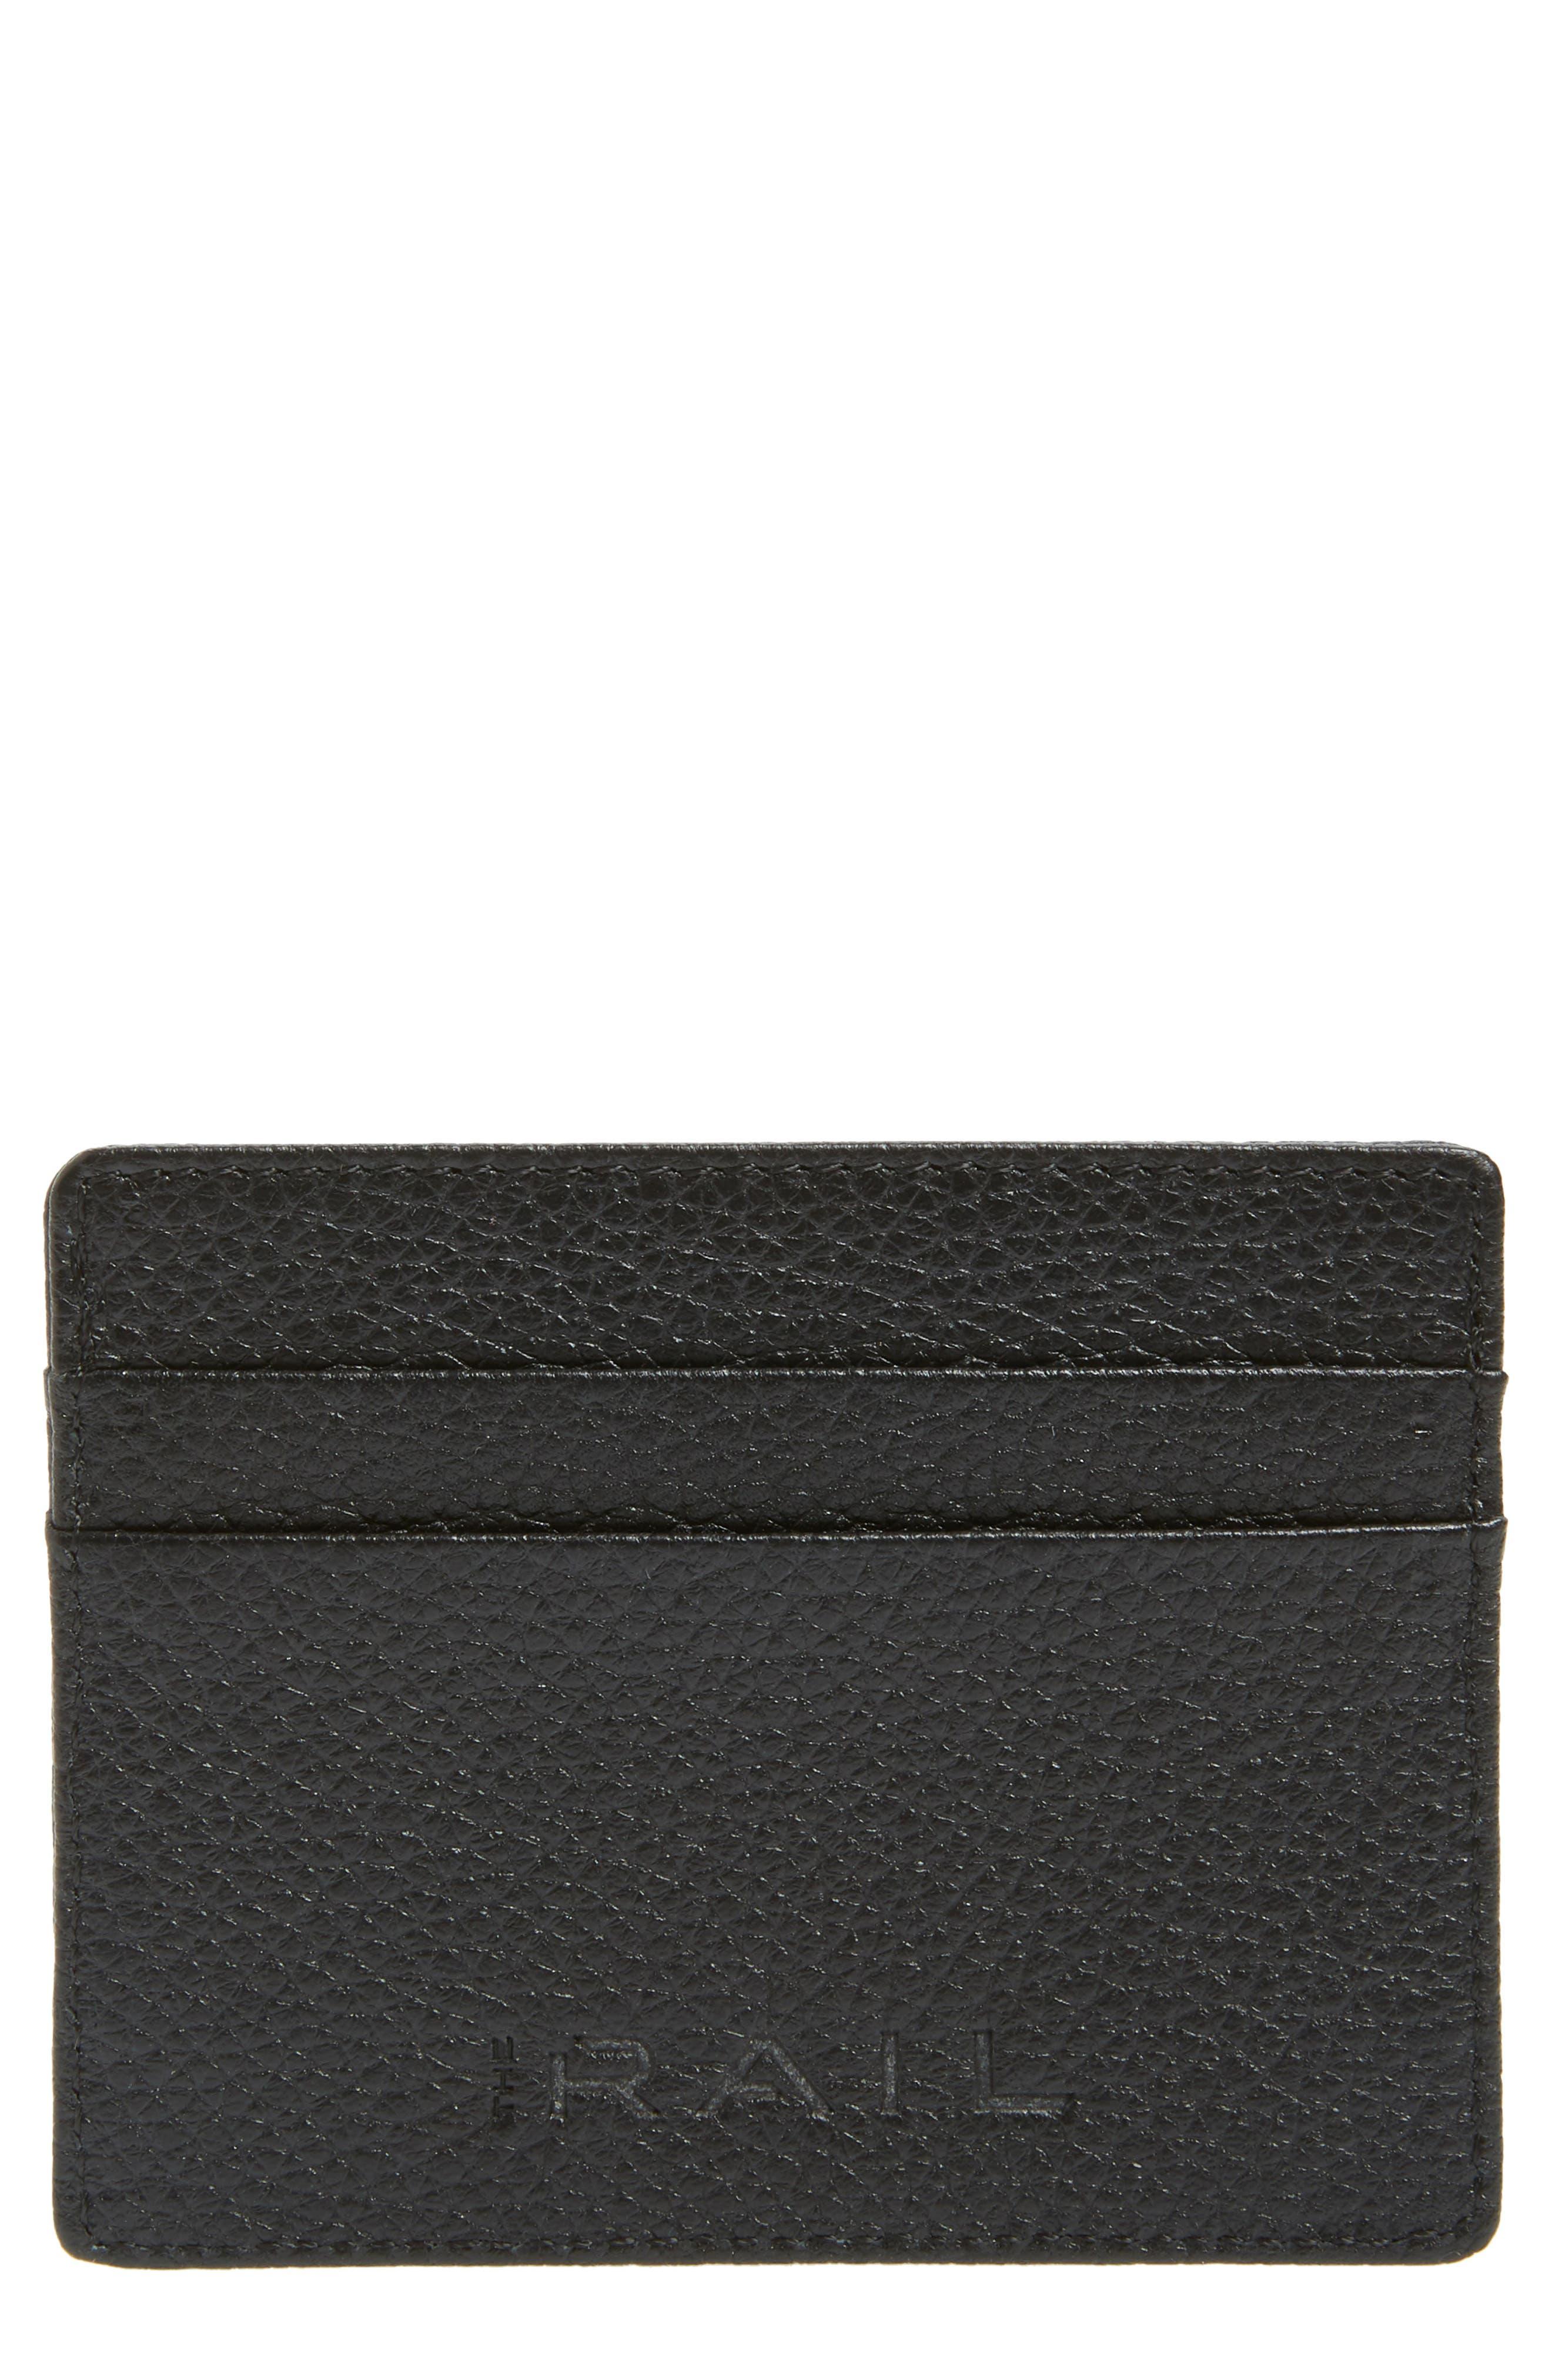 Jamie Leather Card Case,                             Main thumbnail 1, color,                             BLACK CAVIAR